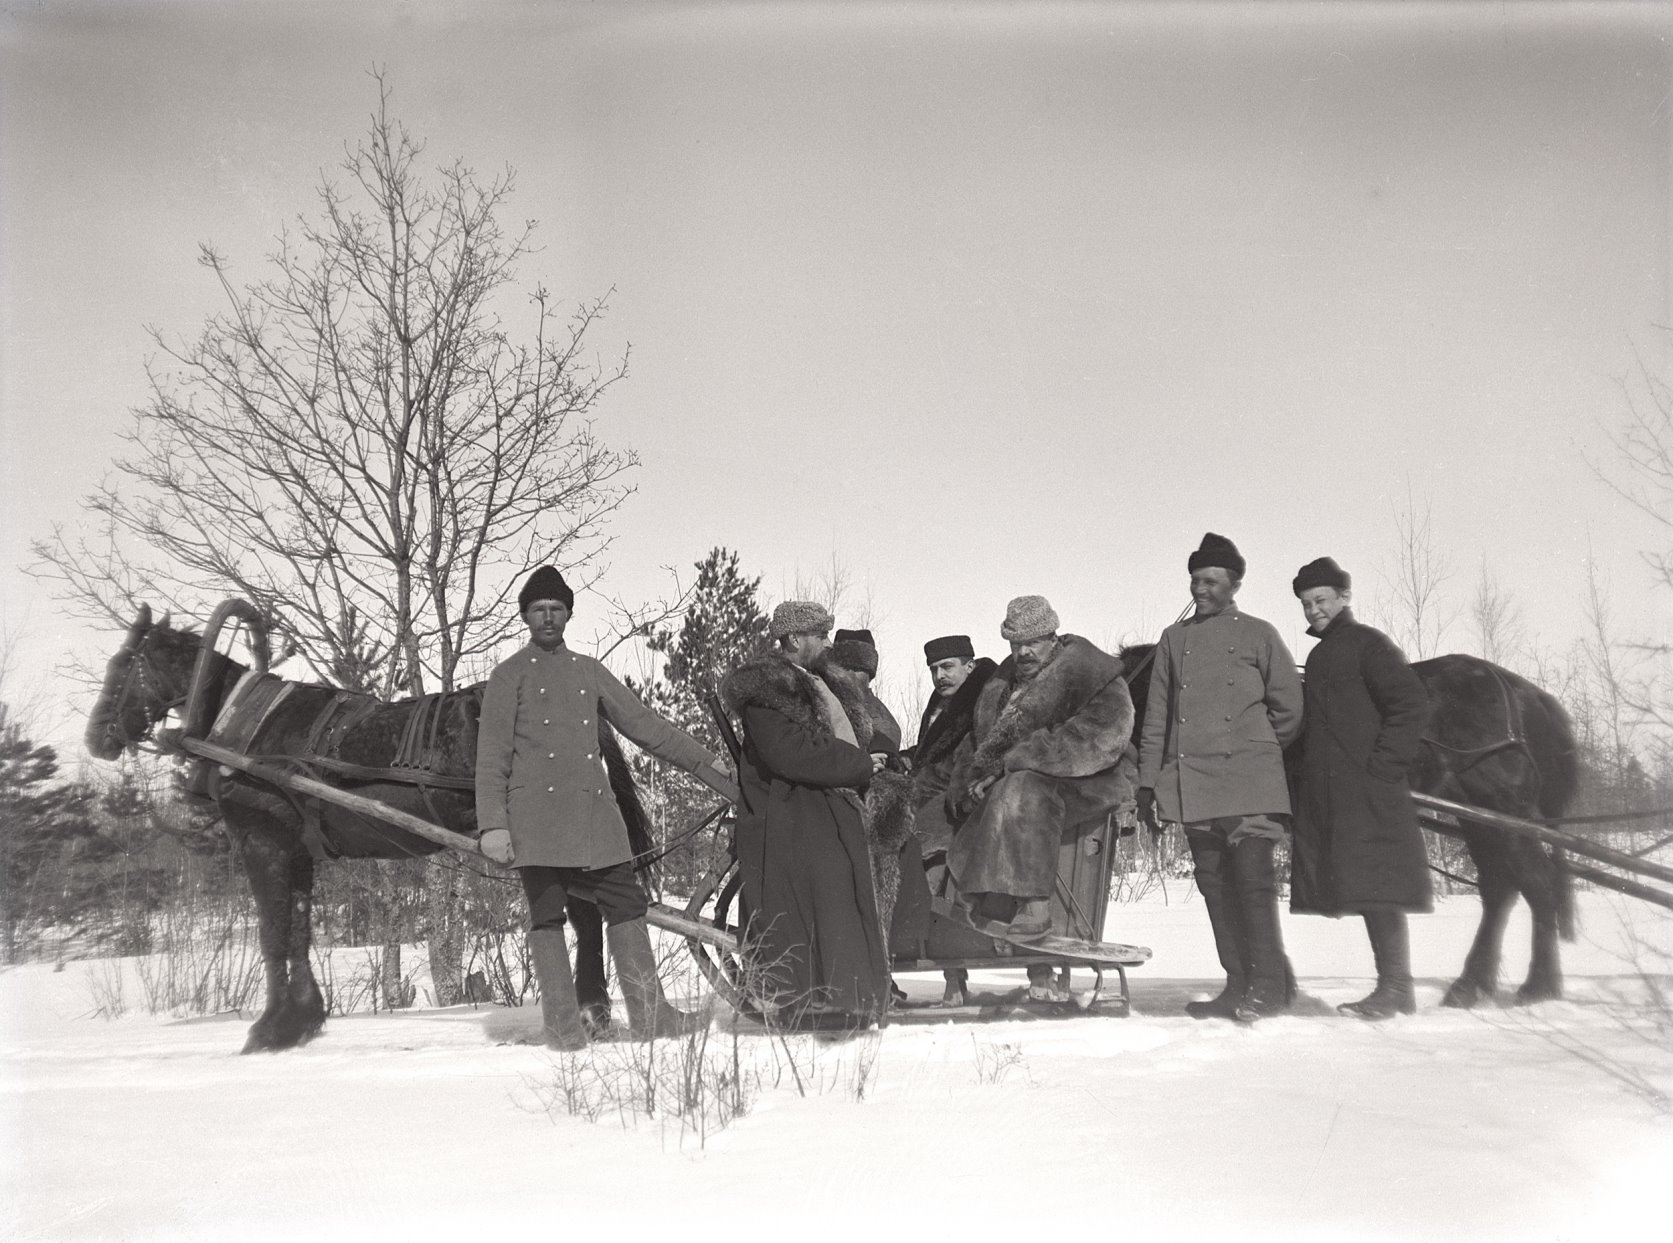 02. 1897. Выезд на зимнюю охоту на лис